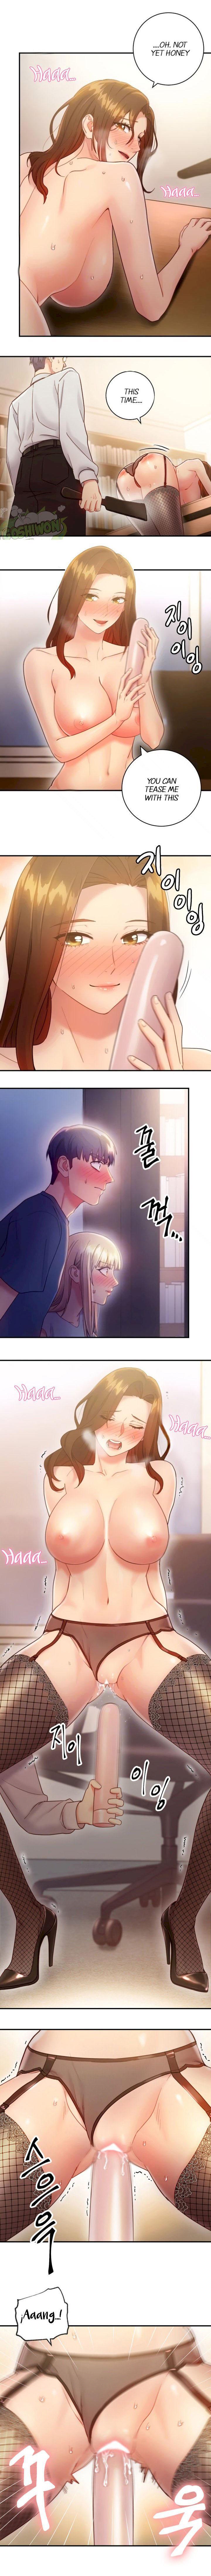 [Neck Pilllow] Stepmother Friends Ch.39/? [English] [Hentai Universe] NEW! 13/10/2020 243